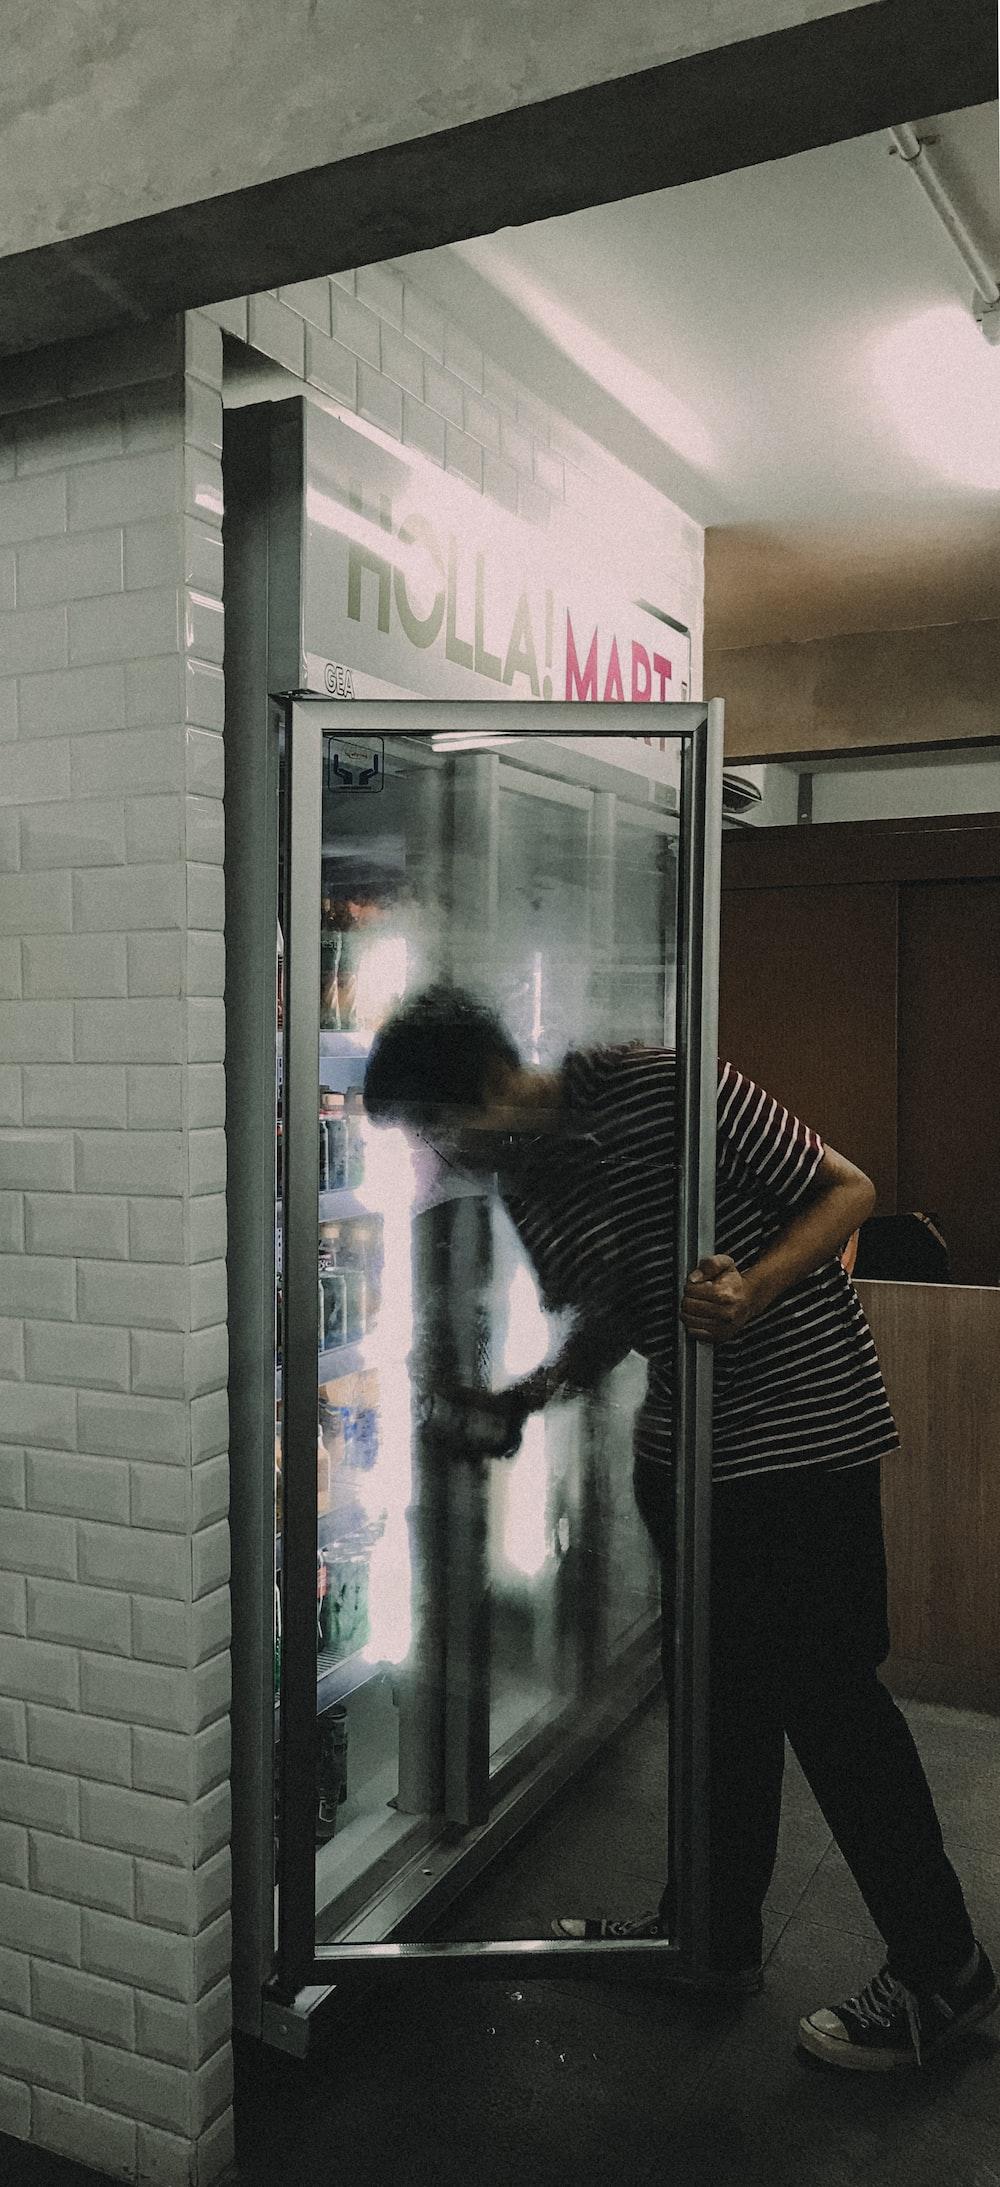 man grabbing drink in fridge